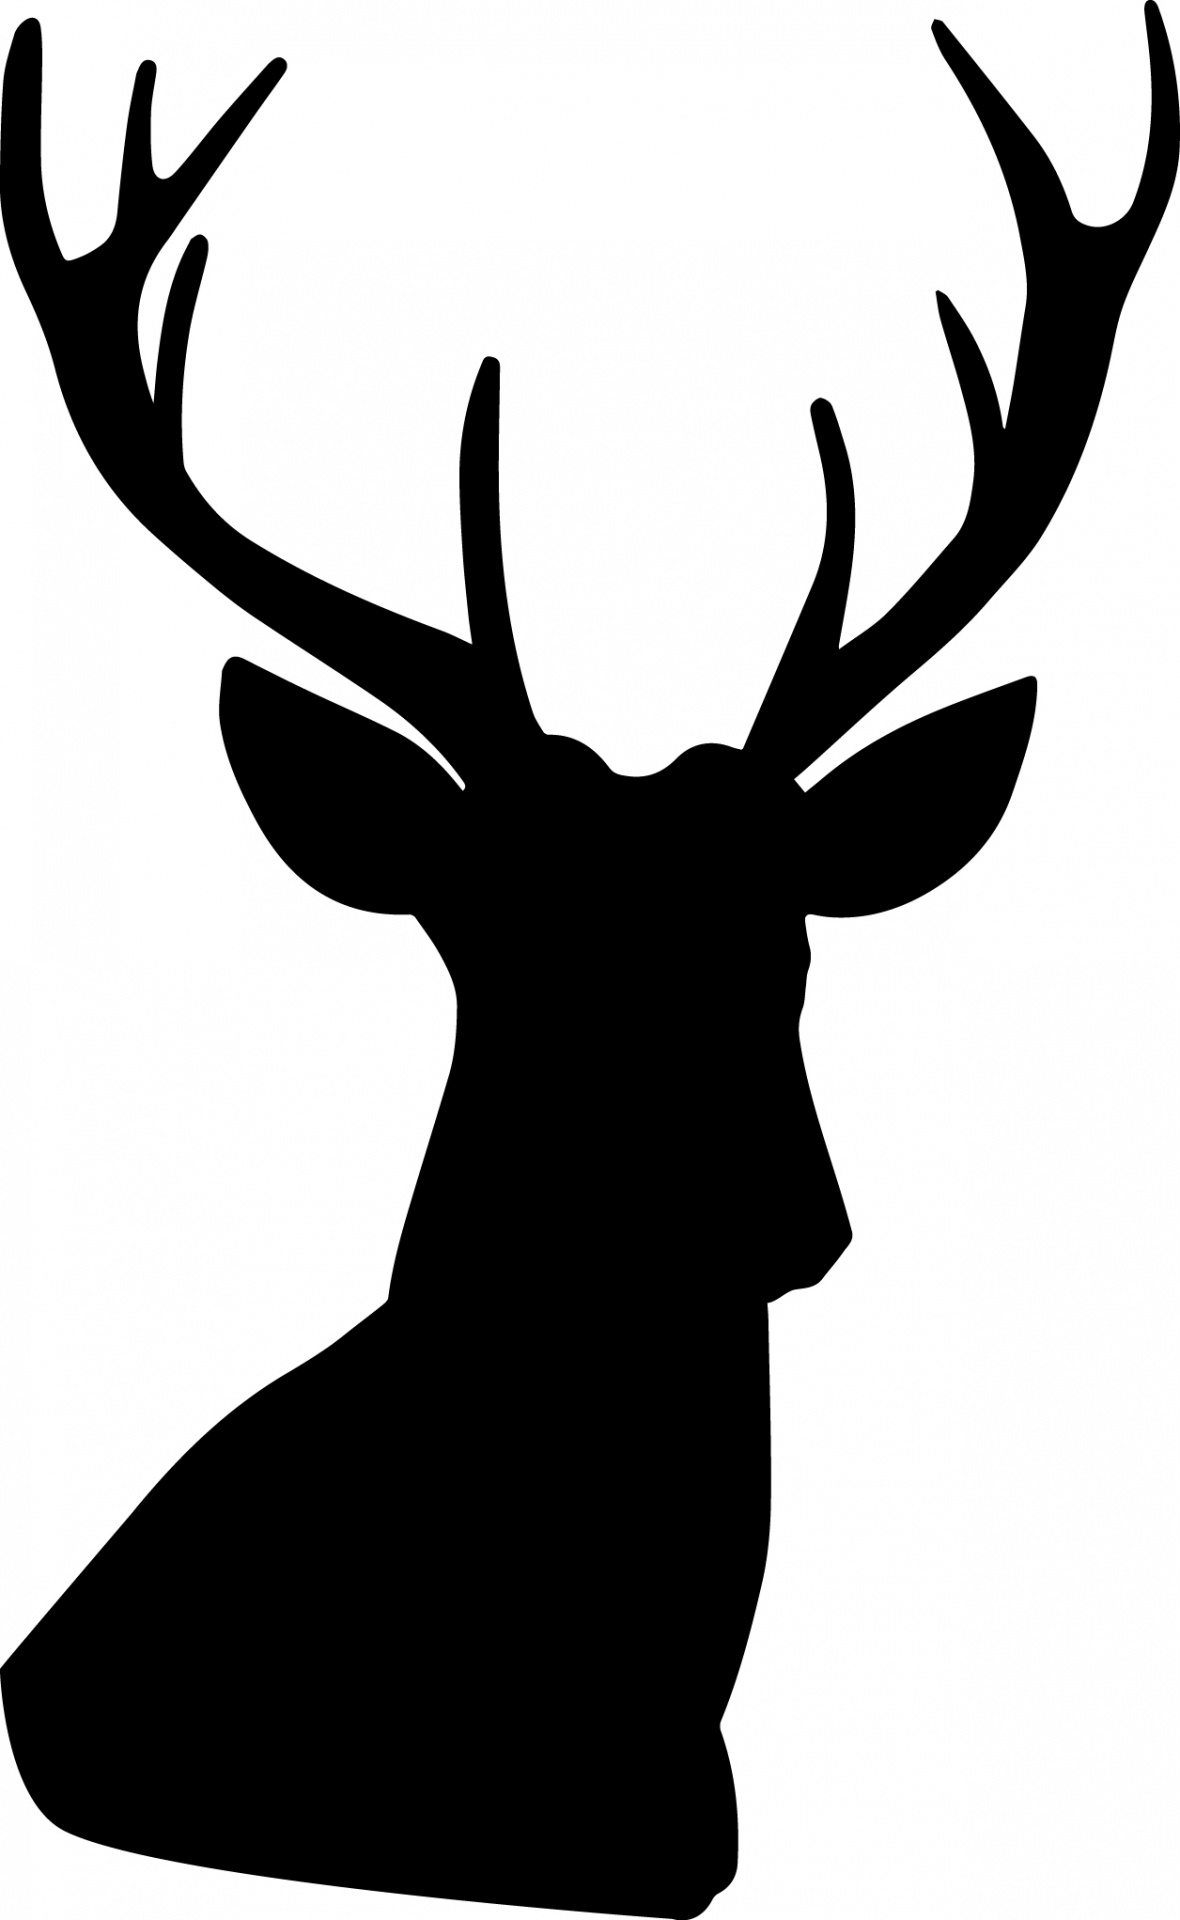 1180x1920 Deer Silhouette Free Stock Photo